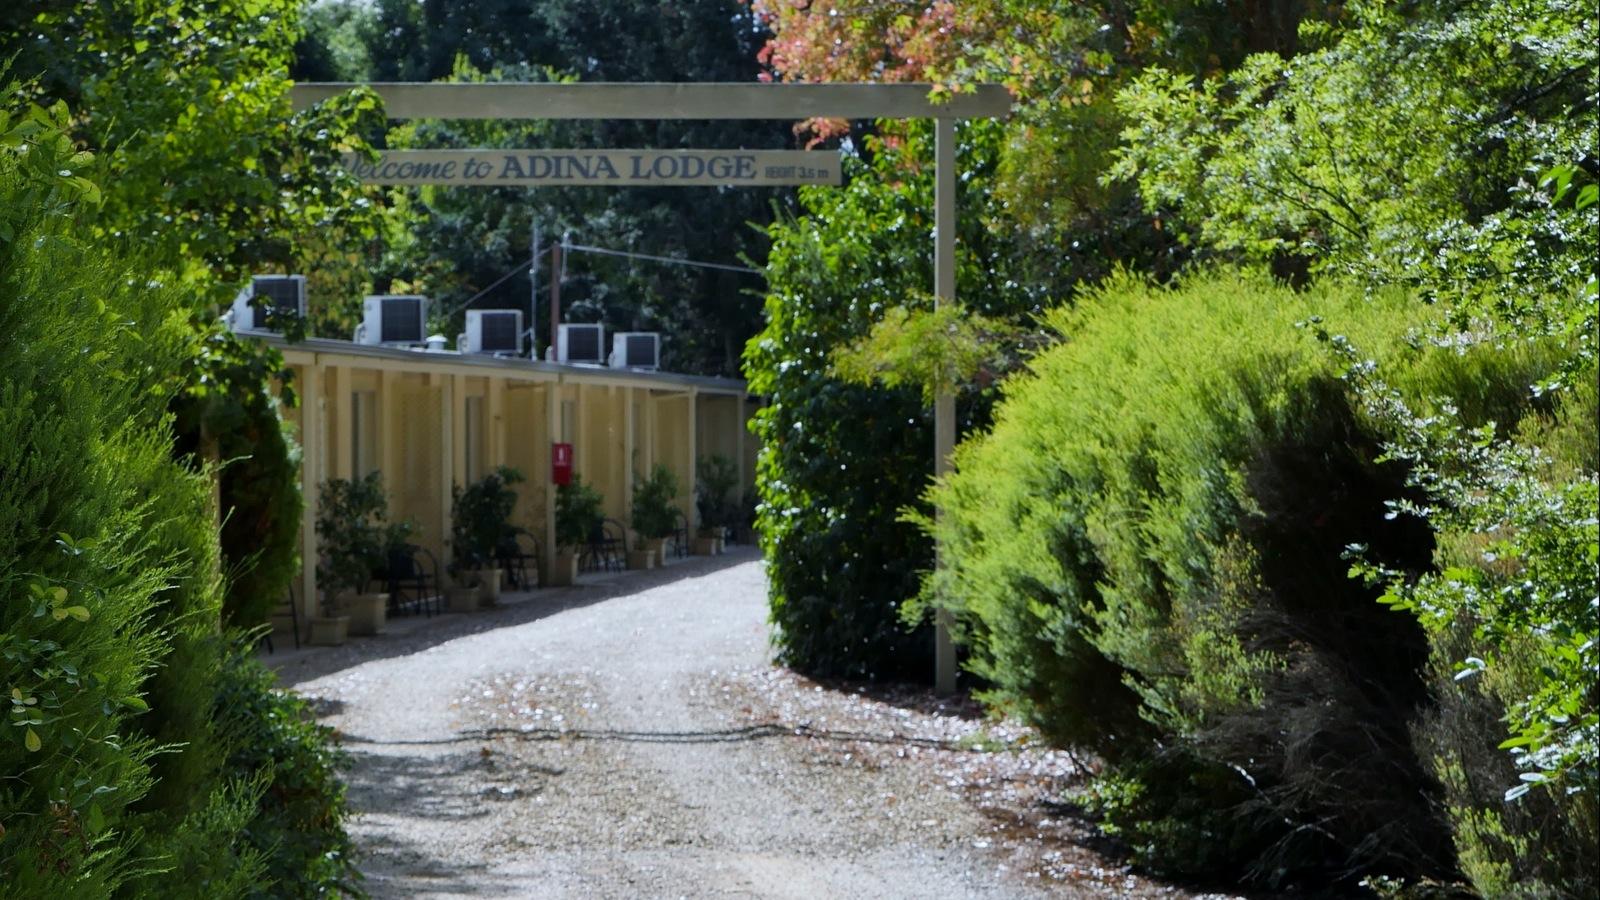 Large Oak trees covers Adina Lodge